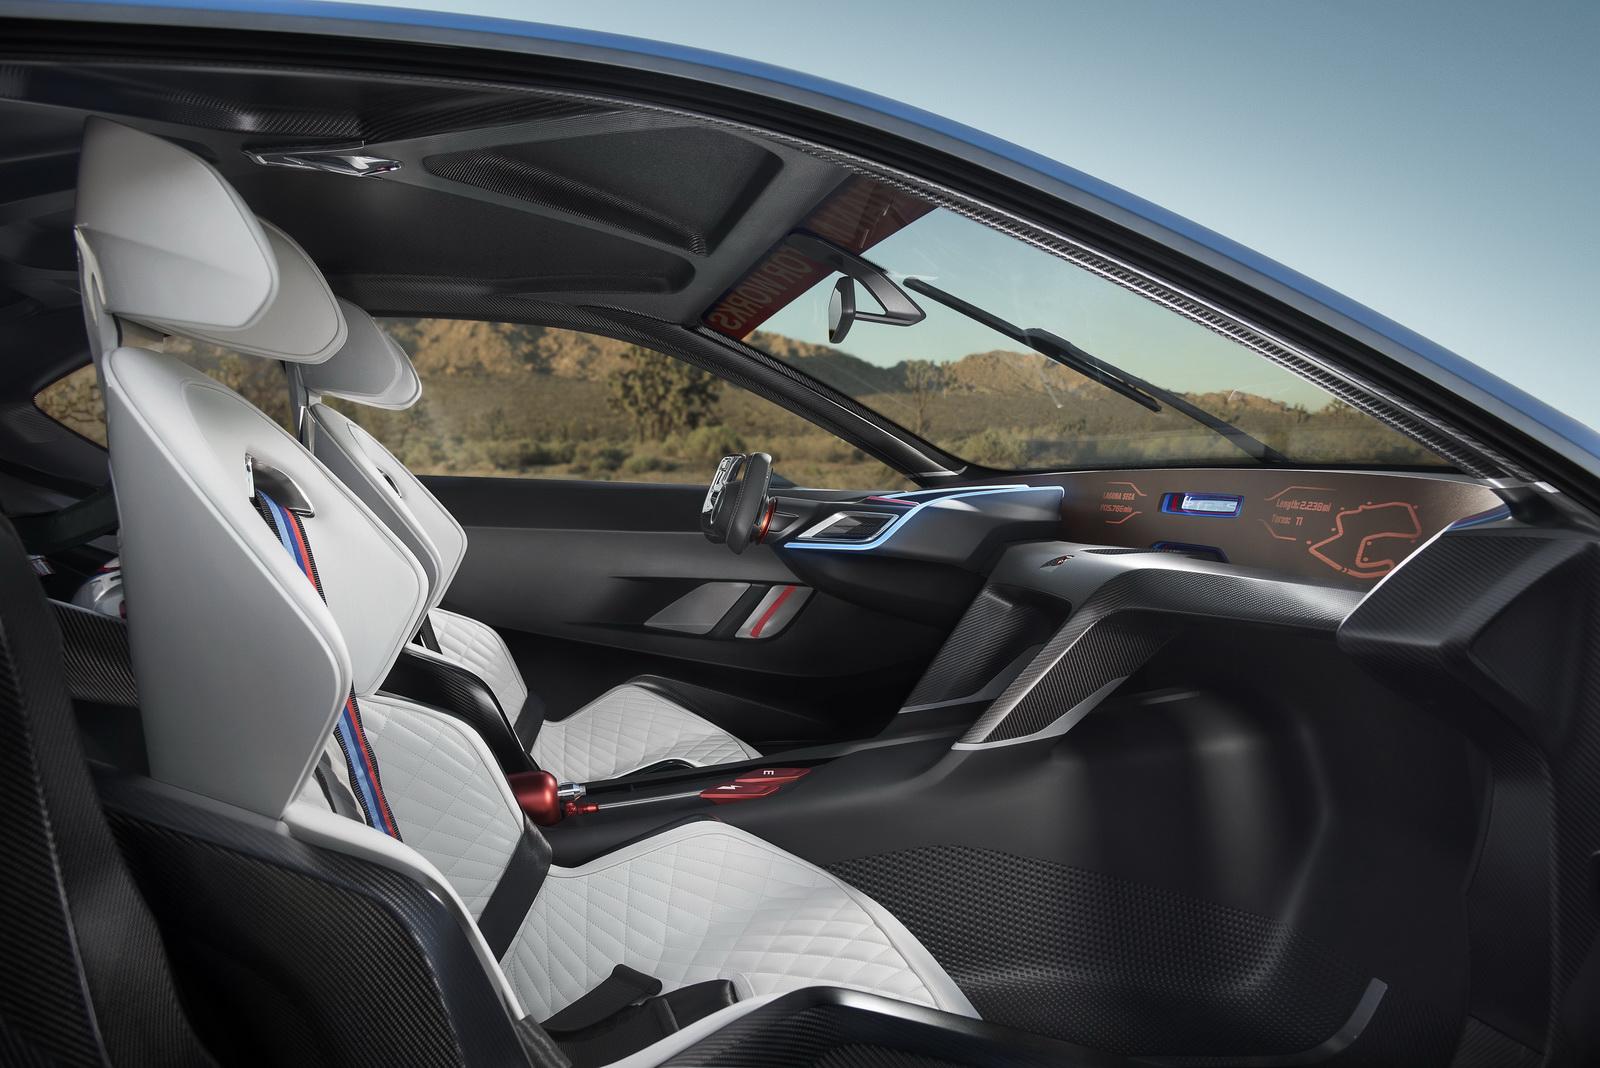 BMW-30-Hommage-R-Concept-36